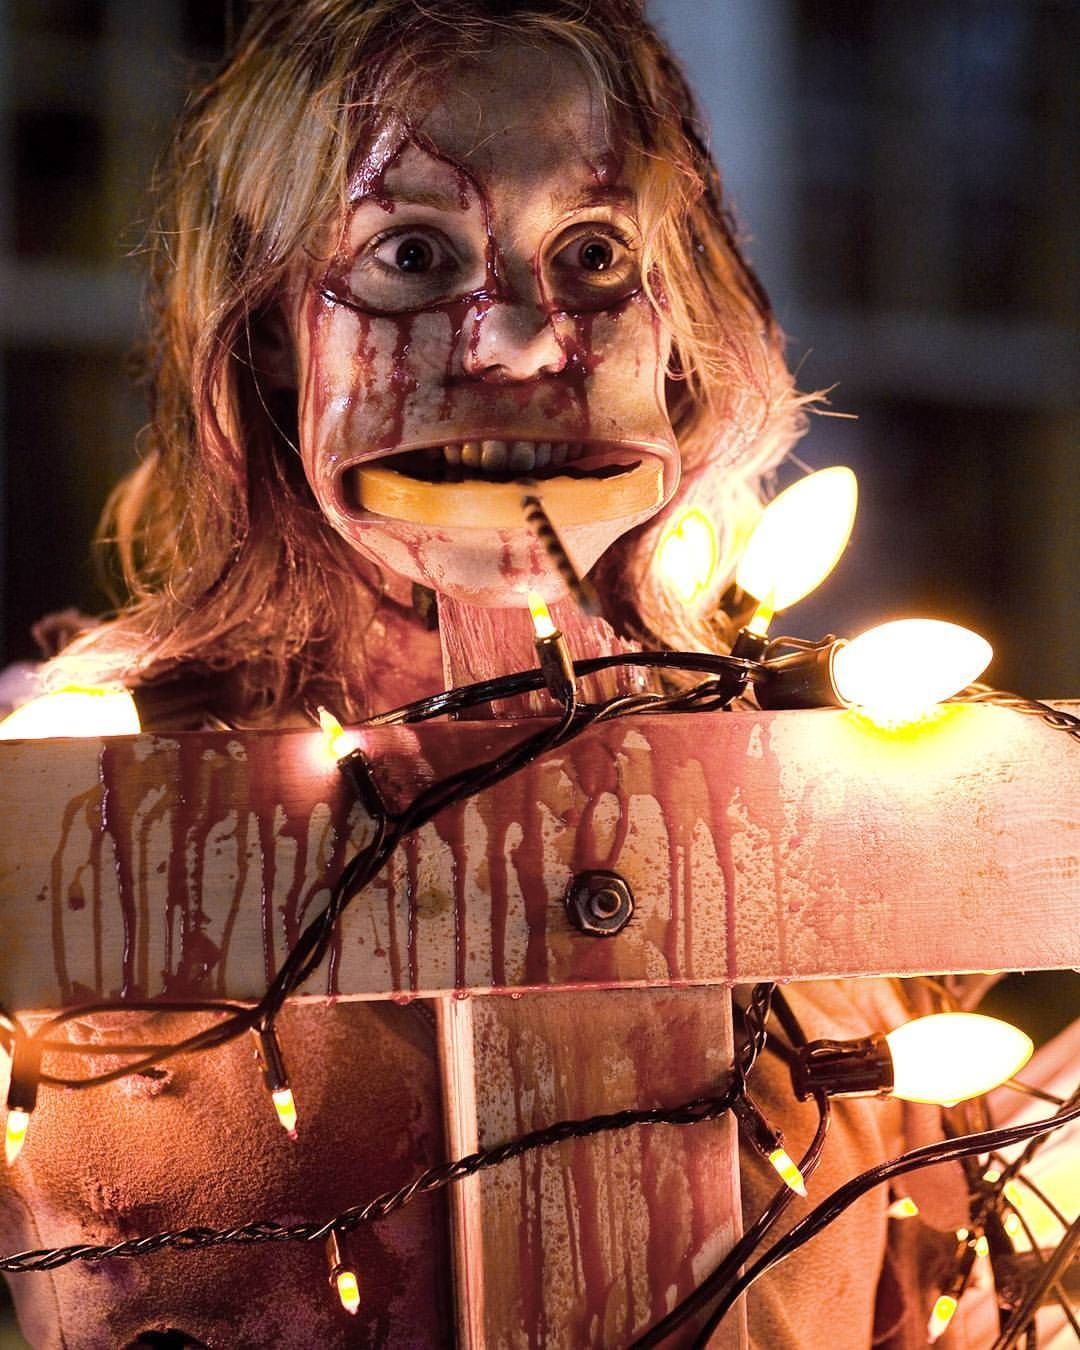 Trick r' Treat Horror artwork, Trick r treat movie, Horror